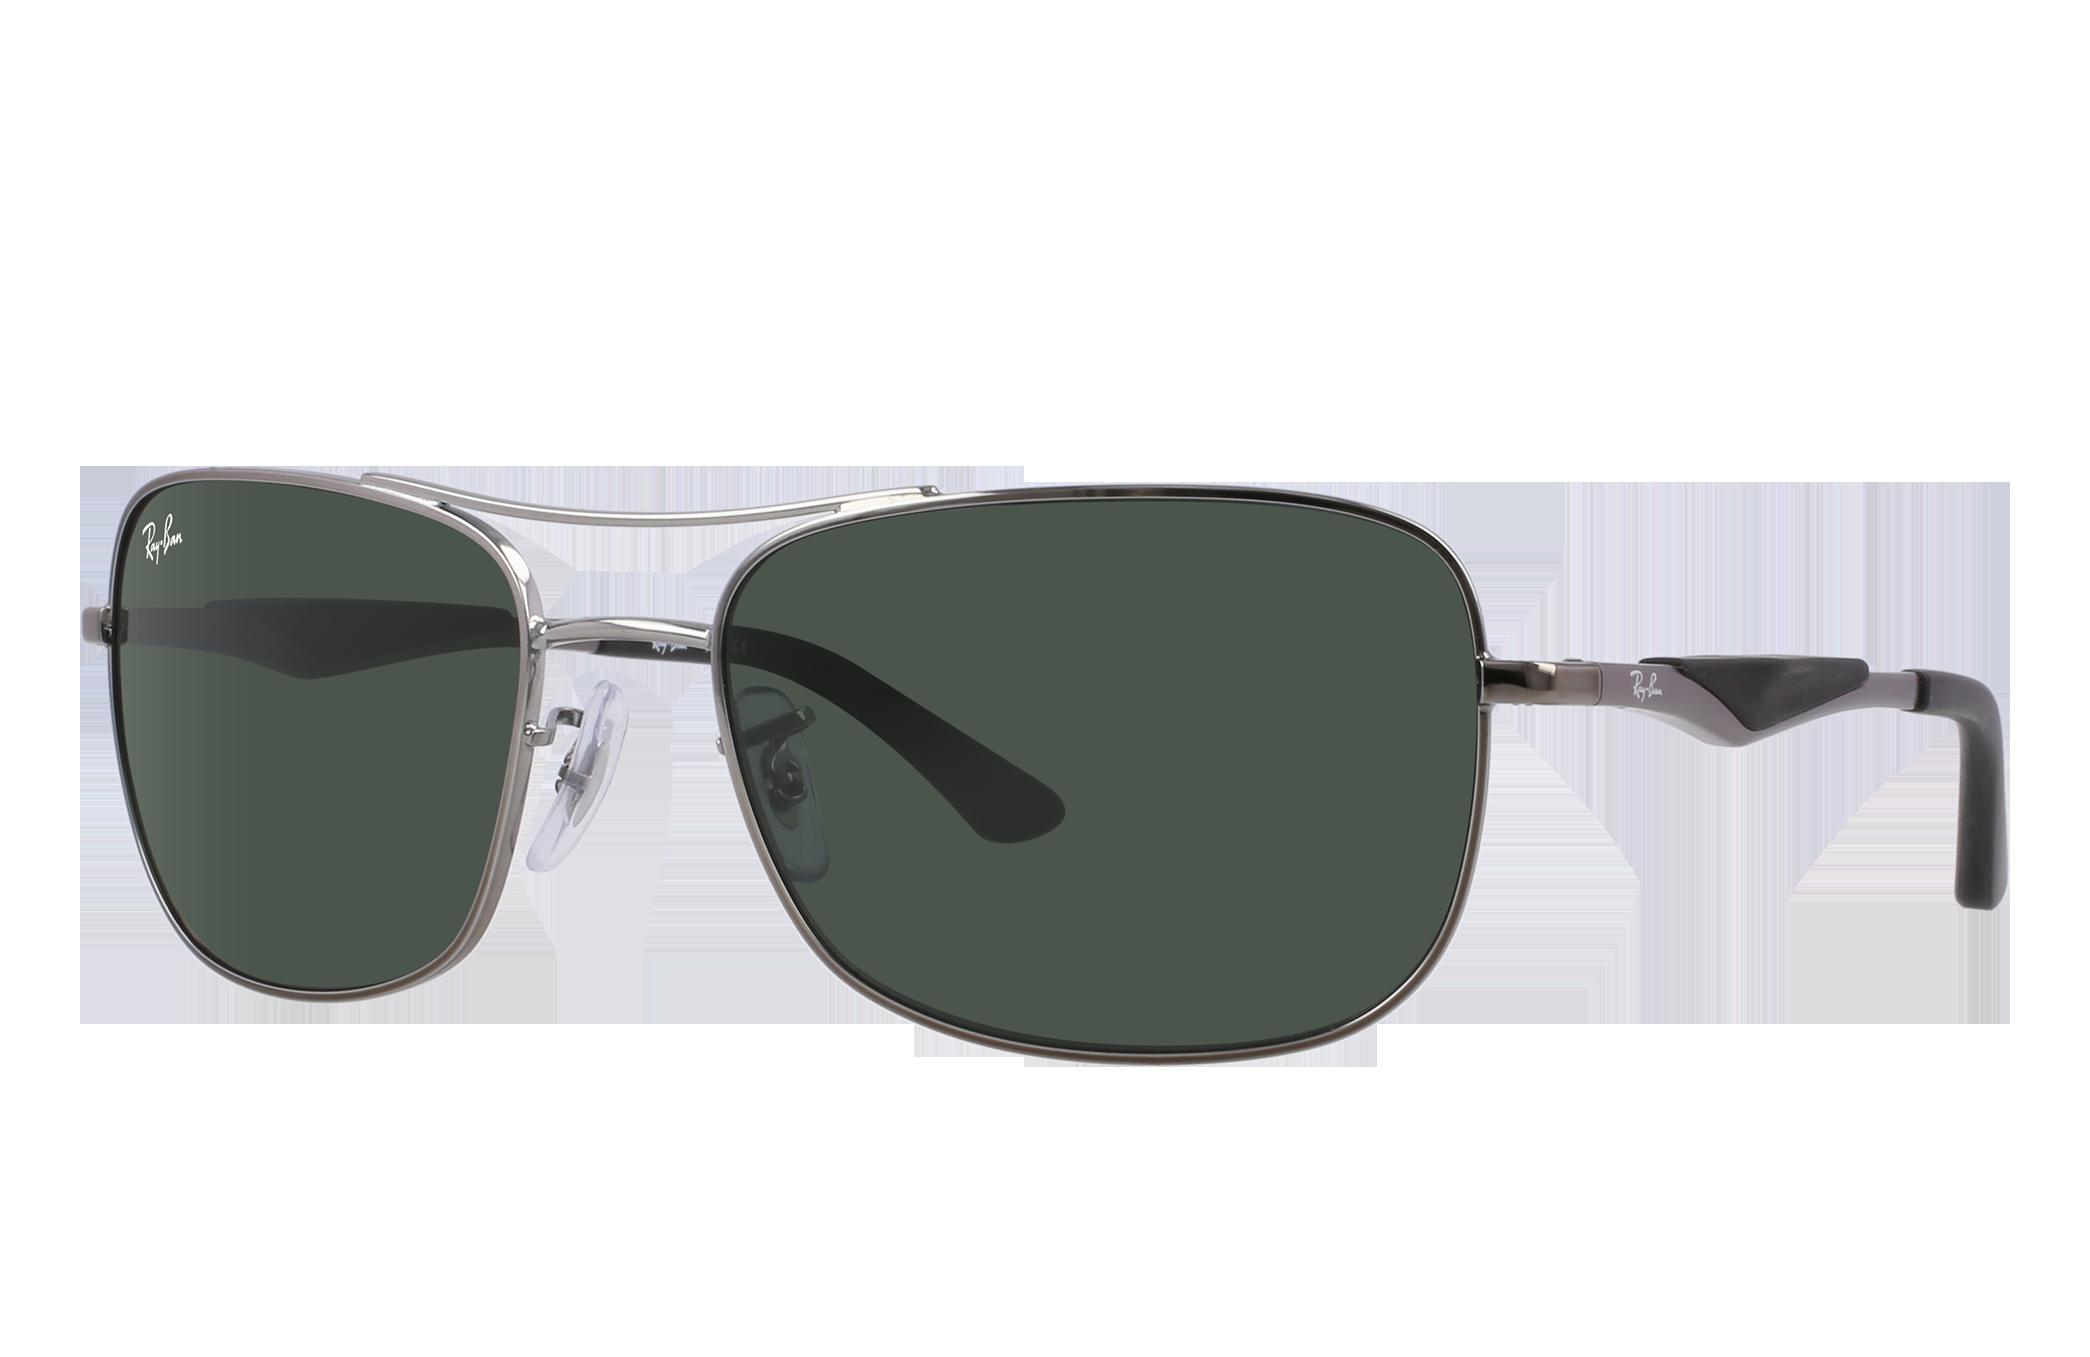 Ray-Ban Rb3515 Gunmetal, Green Lenses - RB3515